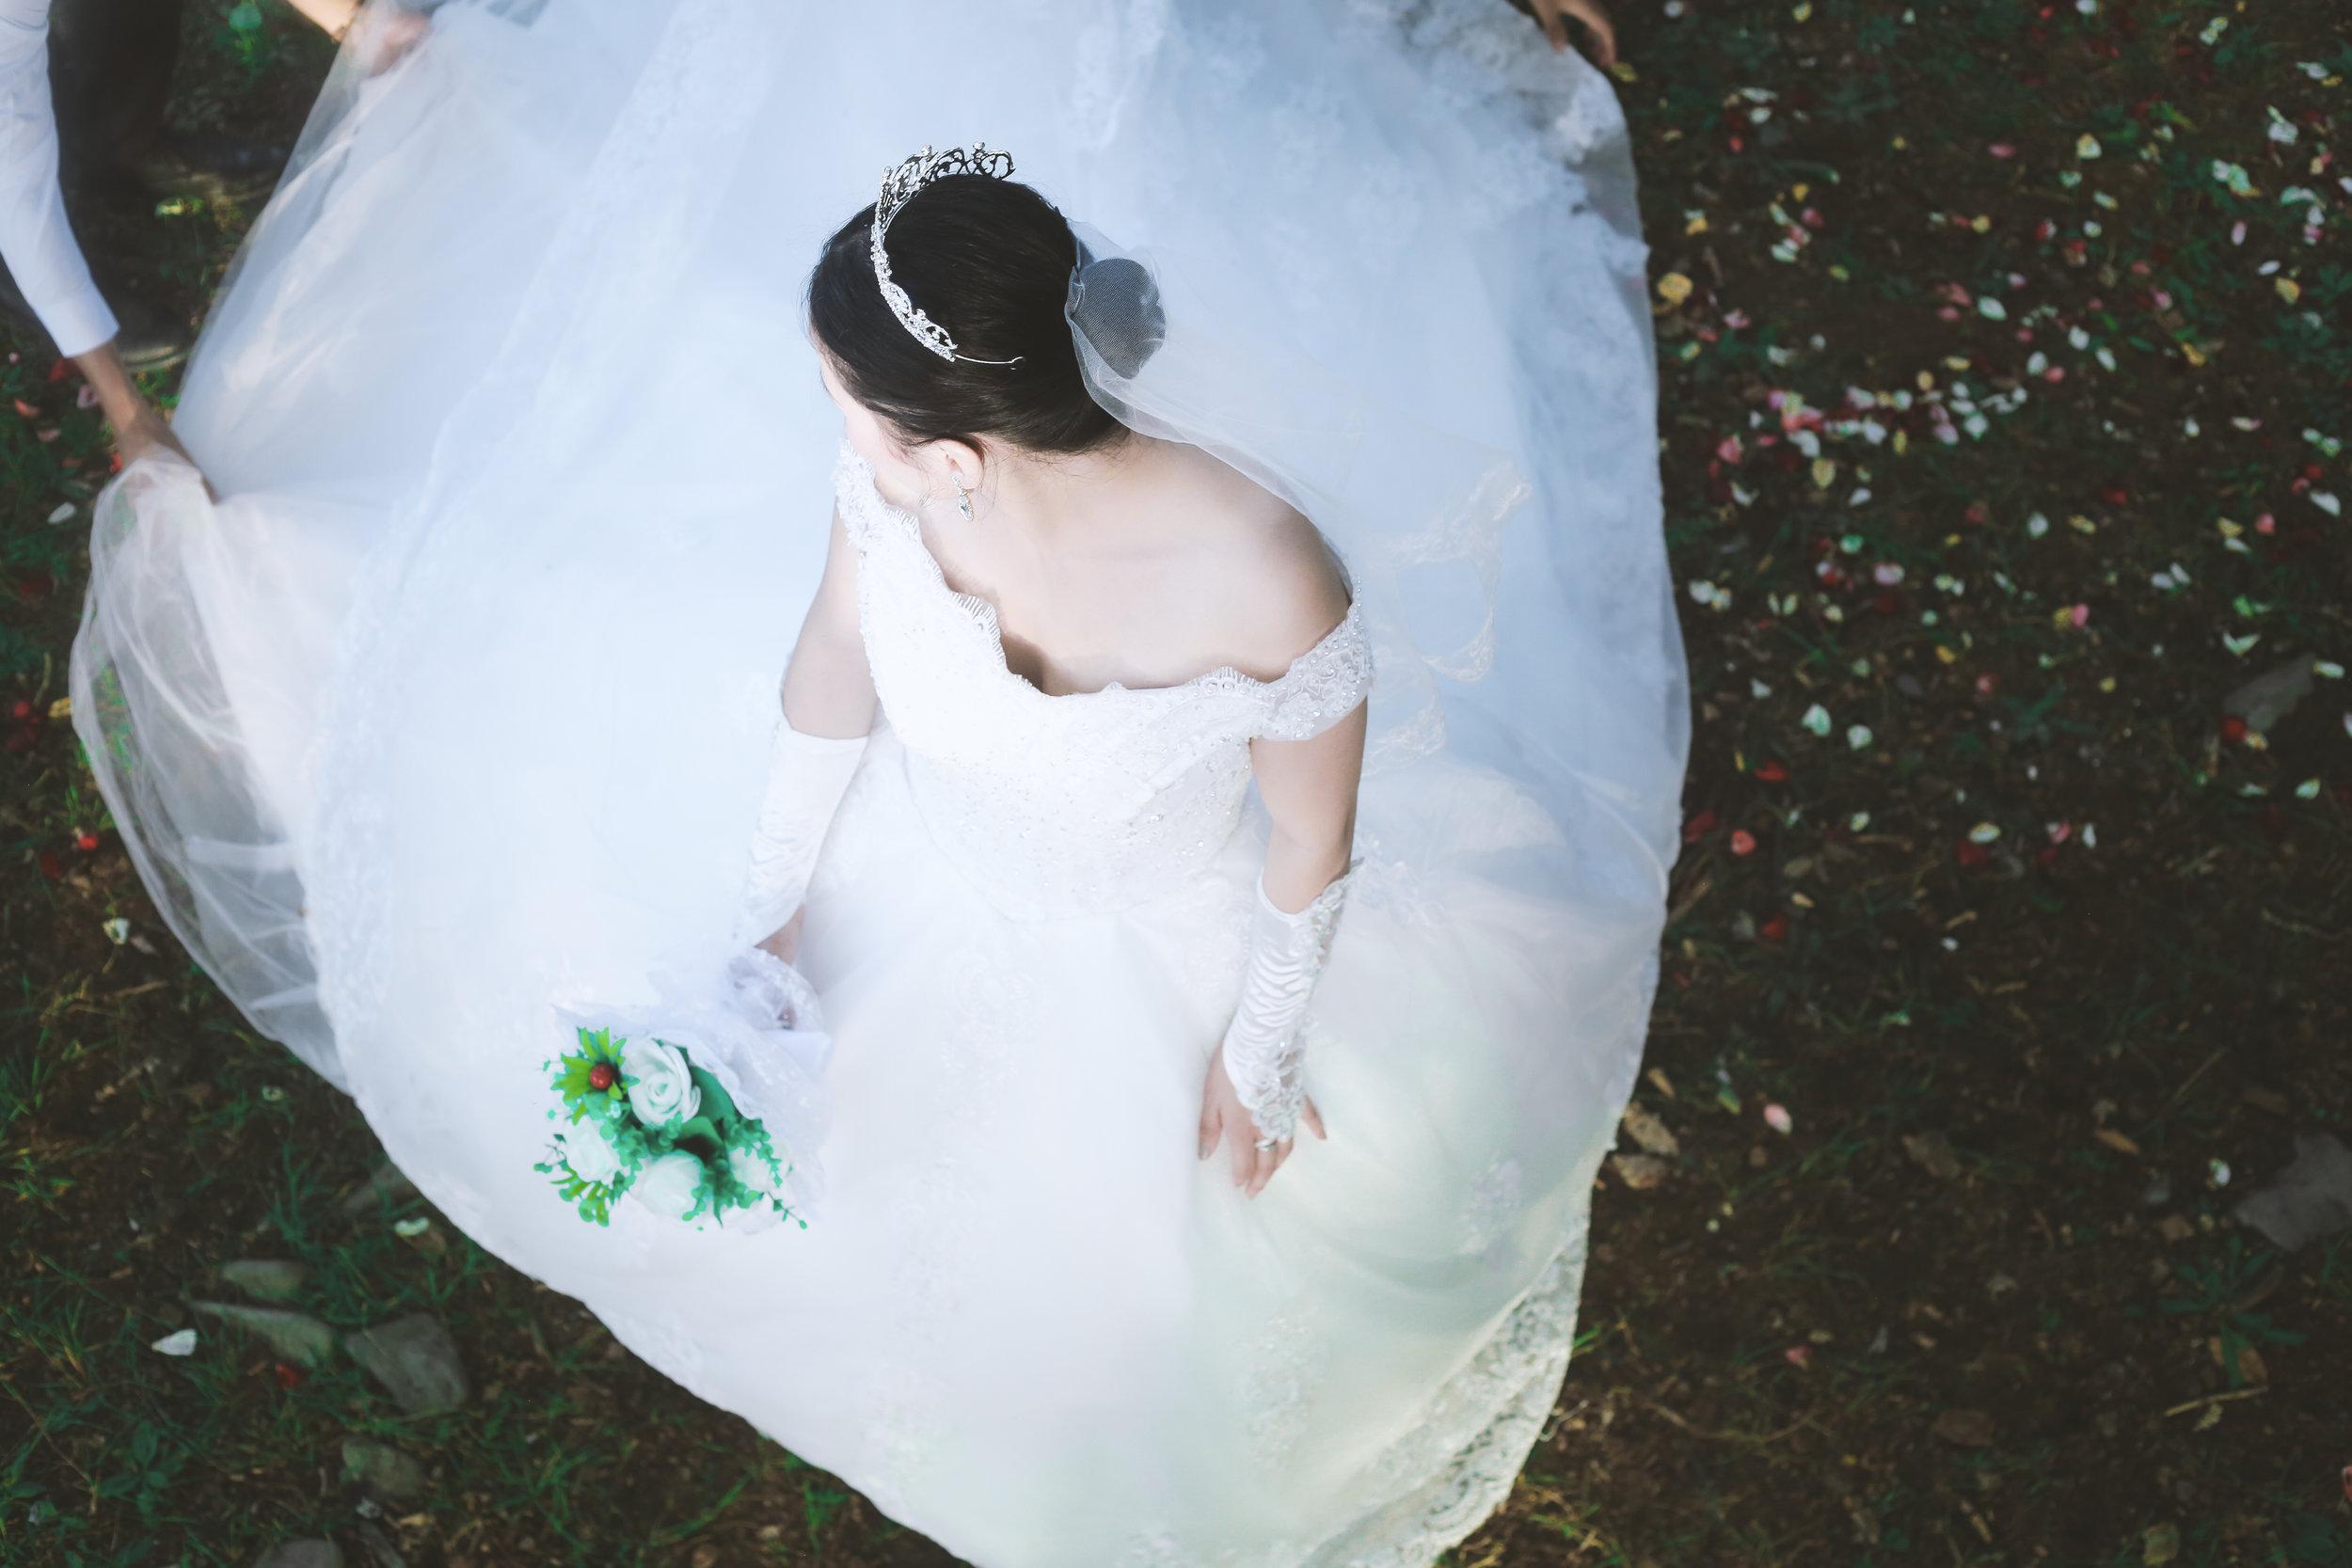 Growing Up Lisa - © 2015Genre: Soft RockTheme: Wedding/Proposal